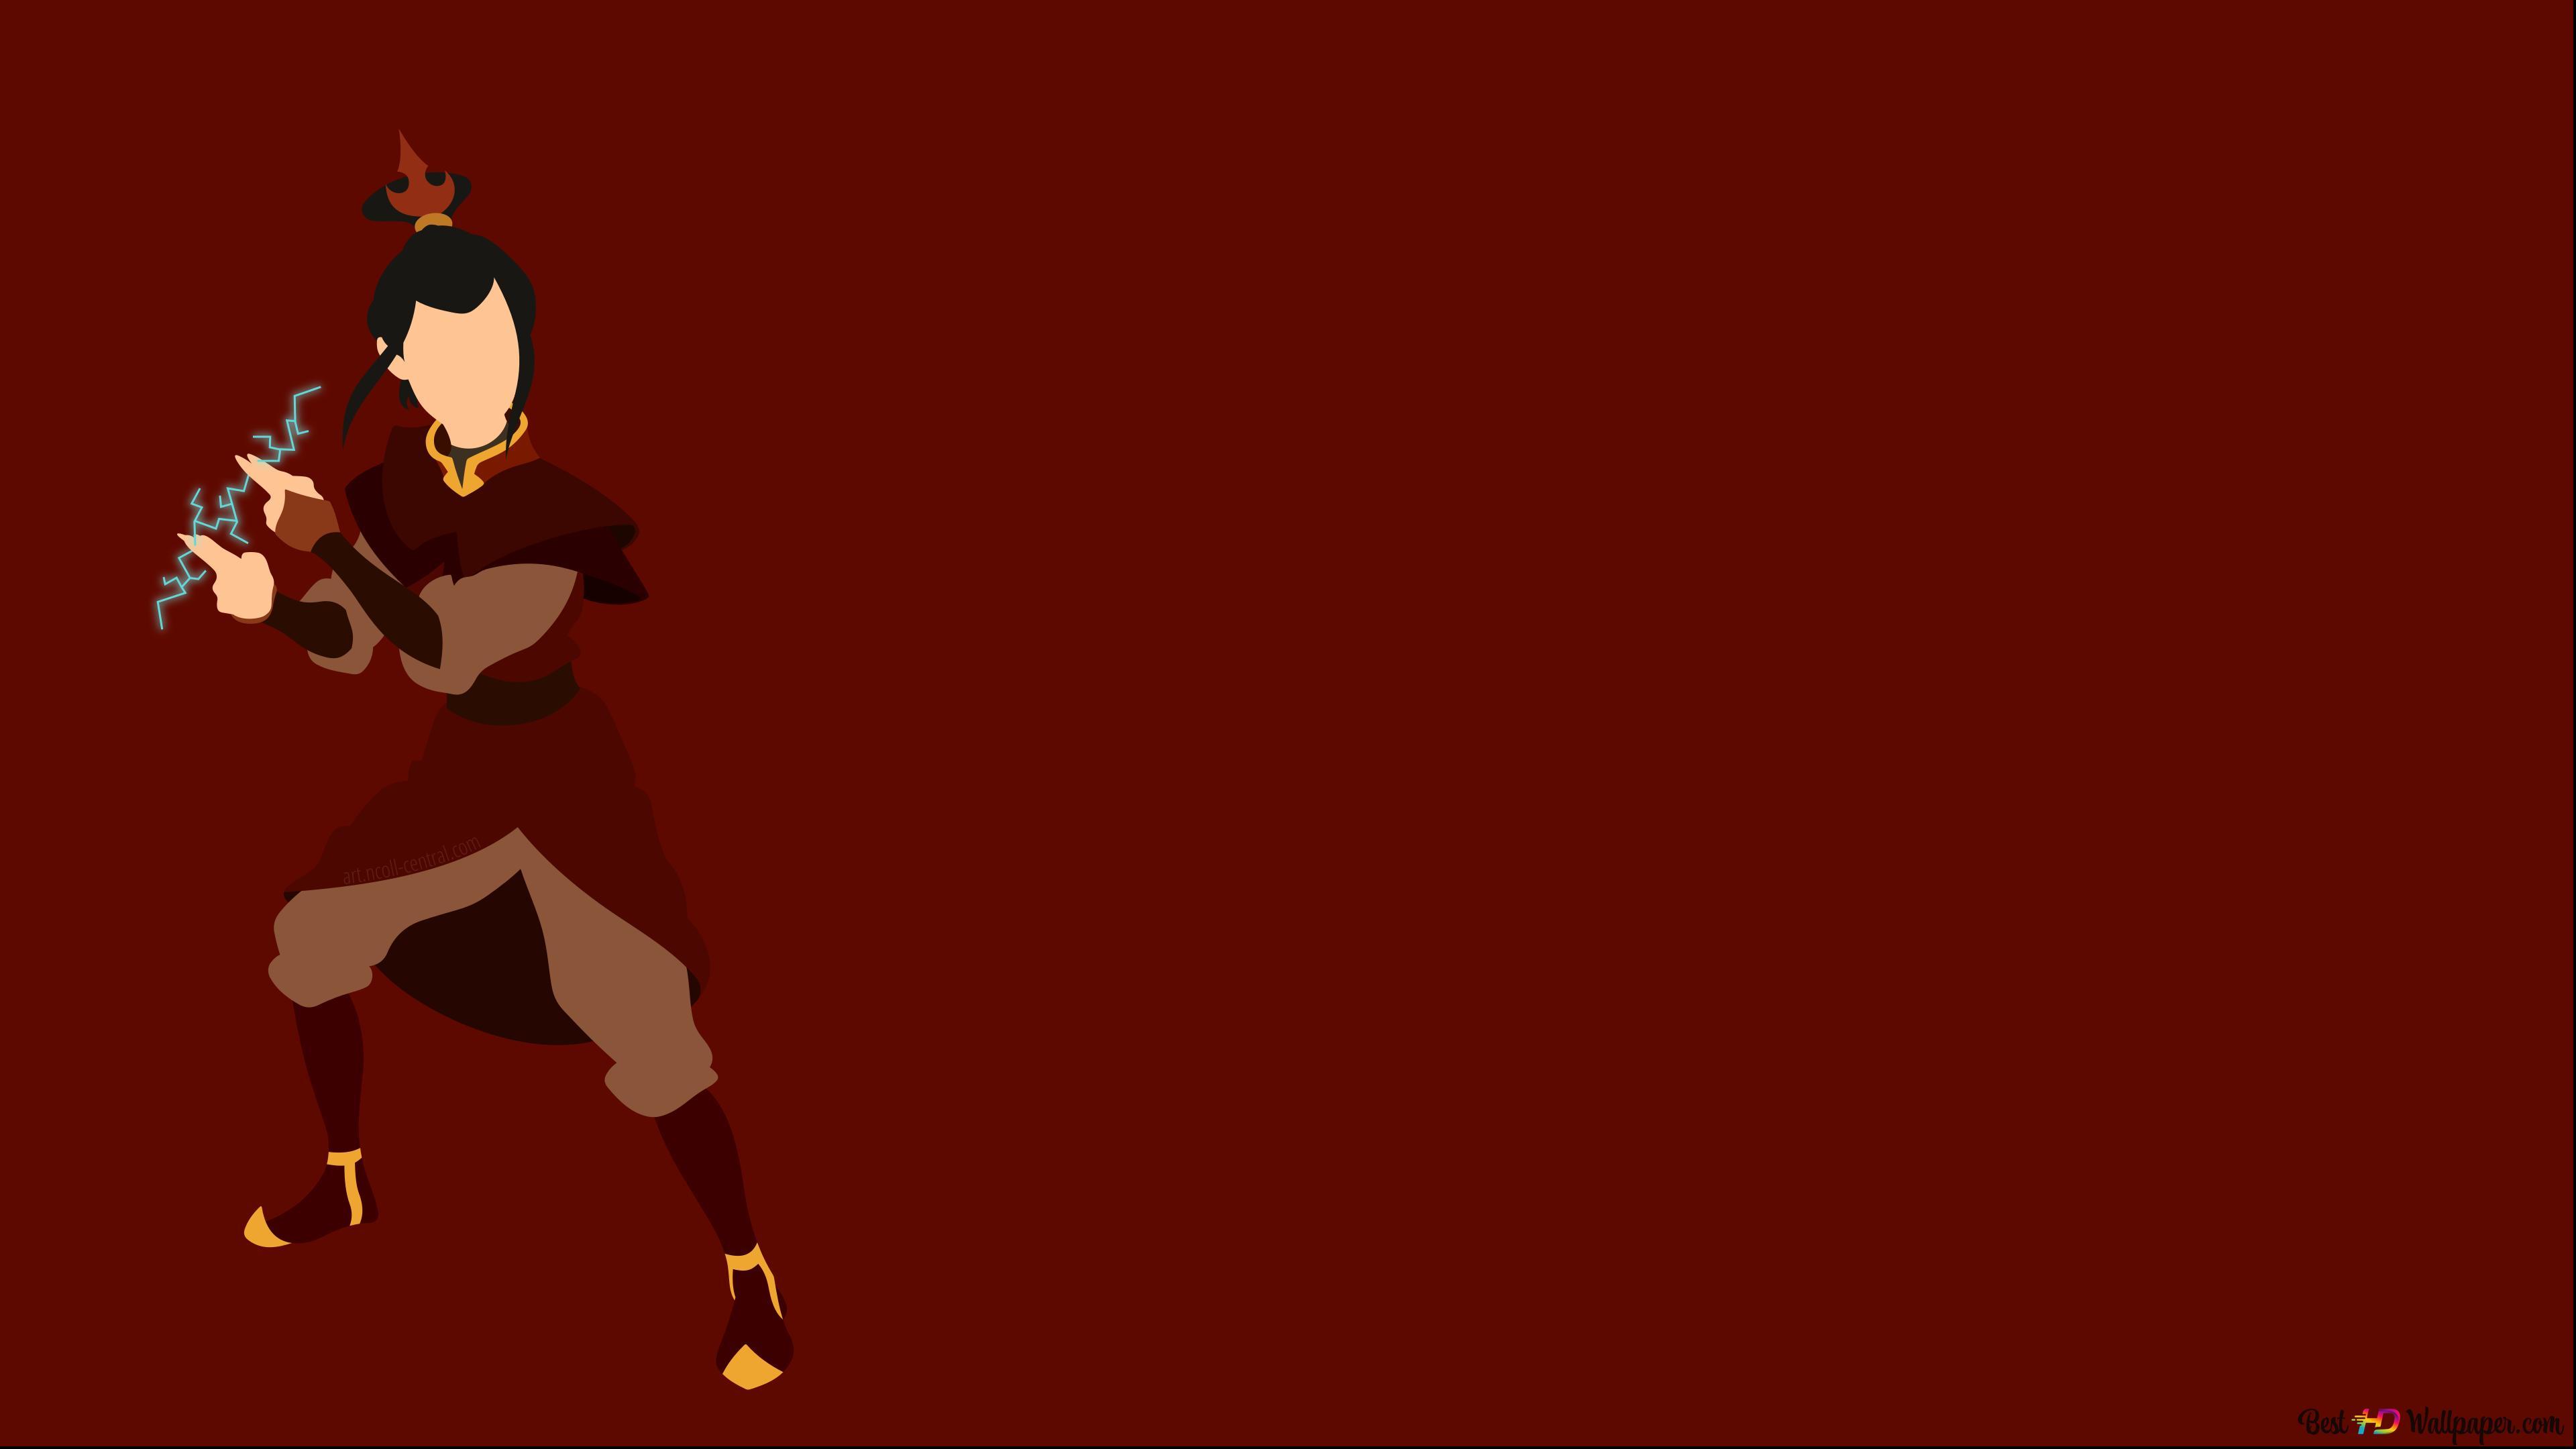 Azula Of Avatar The Last Airbender Hd Wallpaper Download